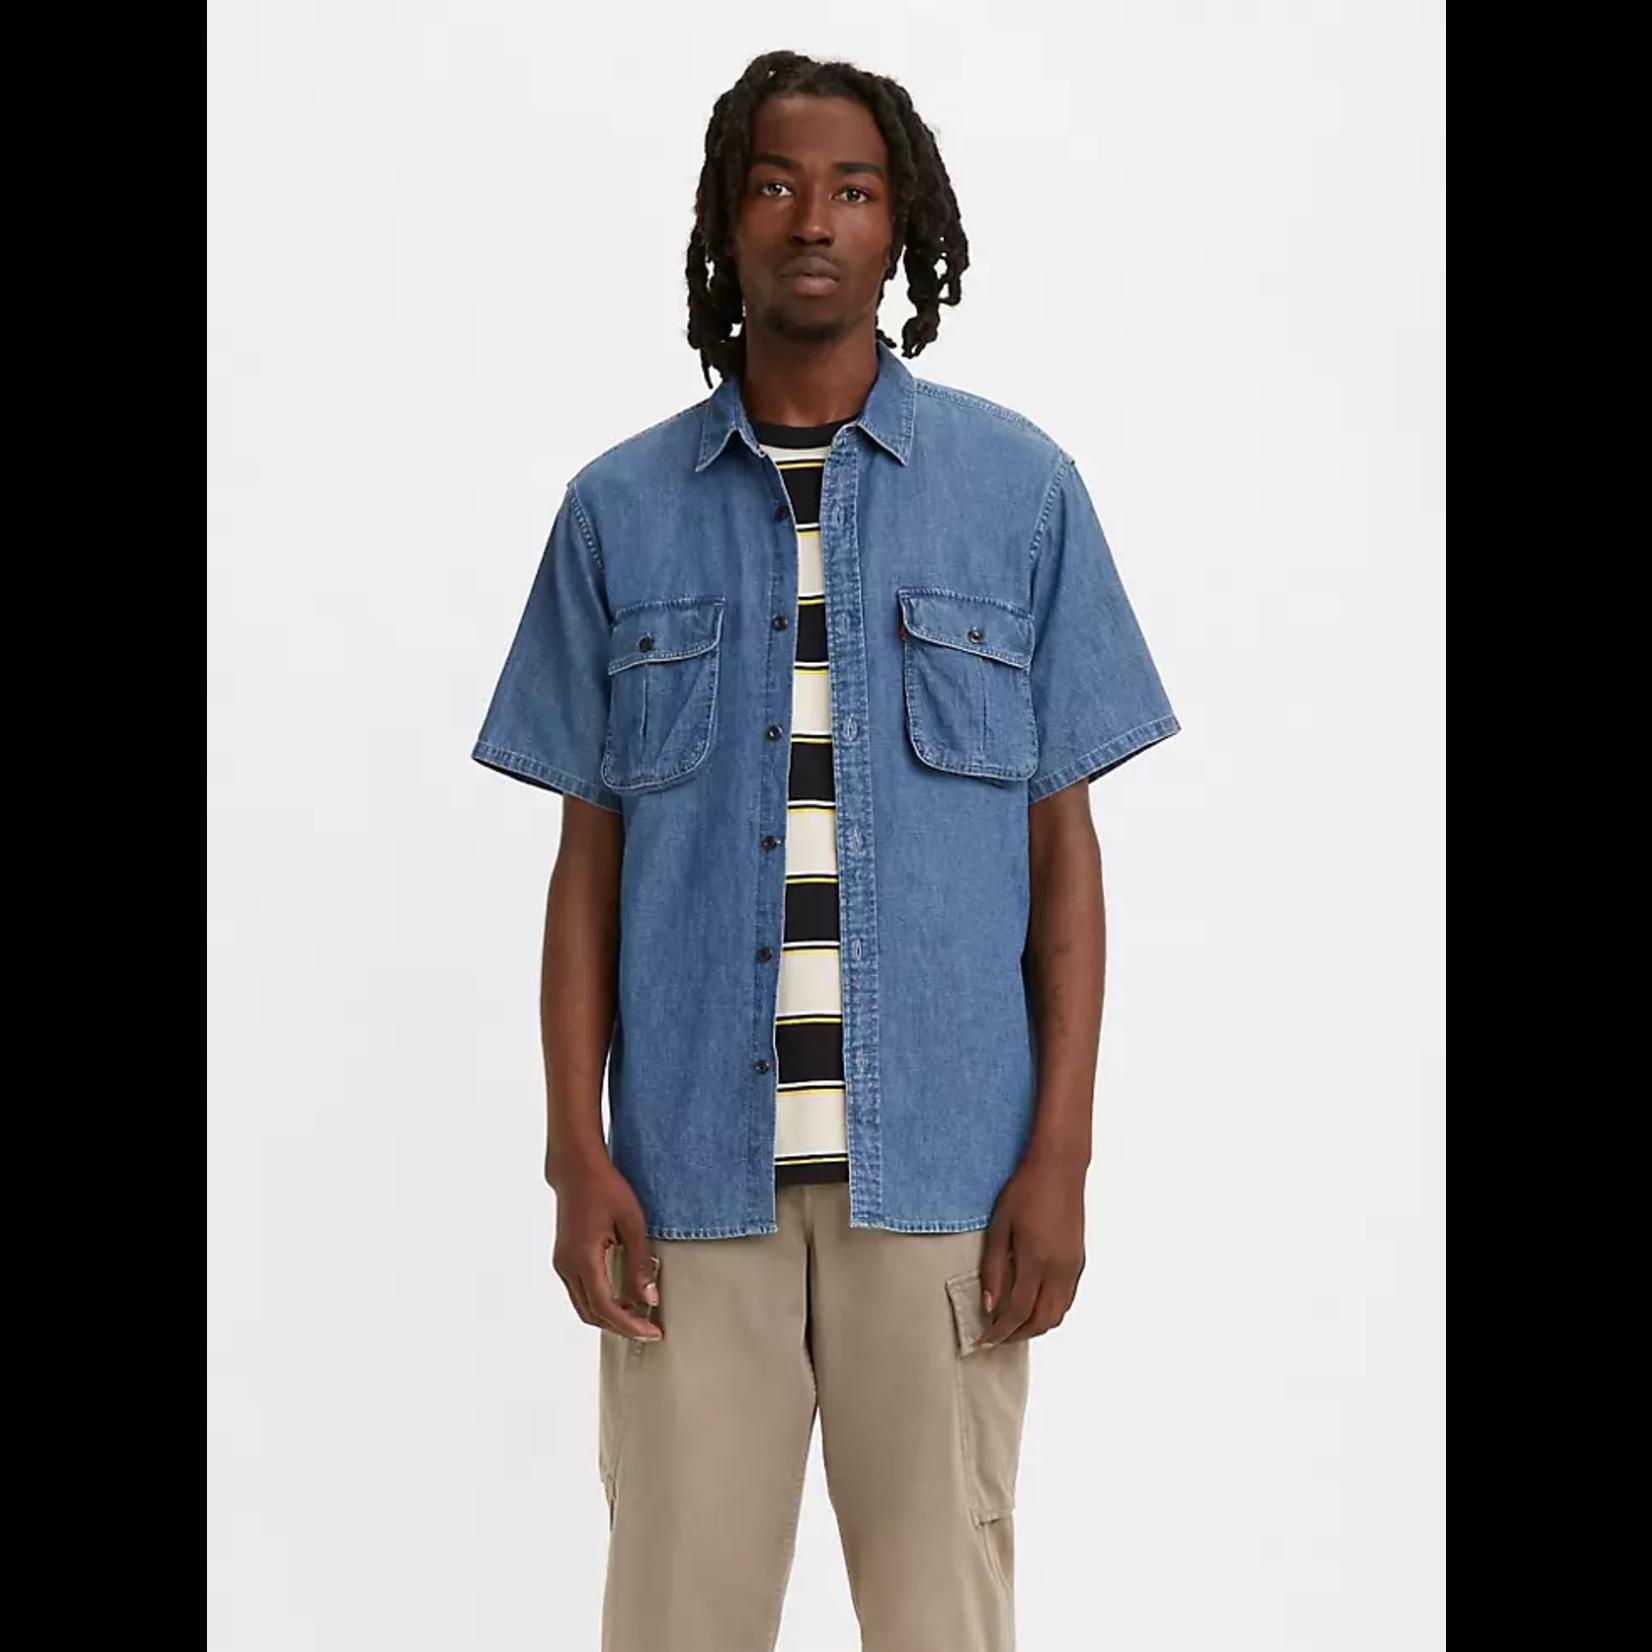 Levis Levi's 39152 Short-Sleeve Two-Pocket Relaxed Safari Shirt